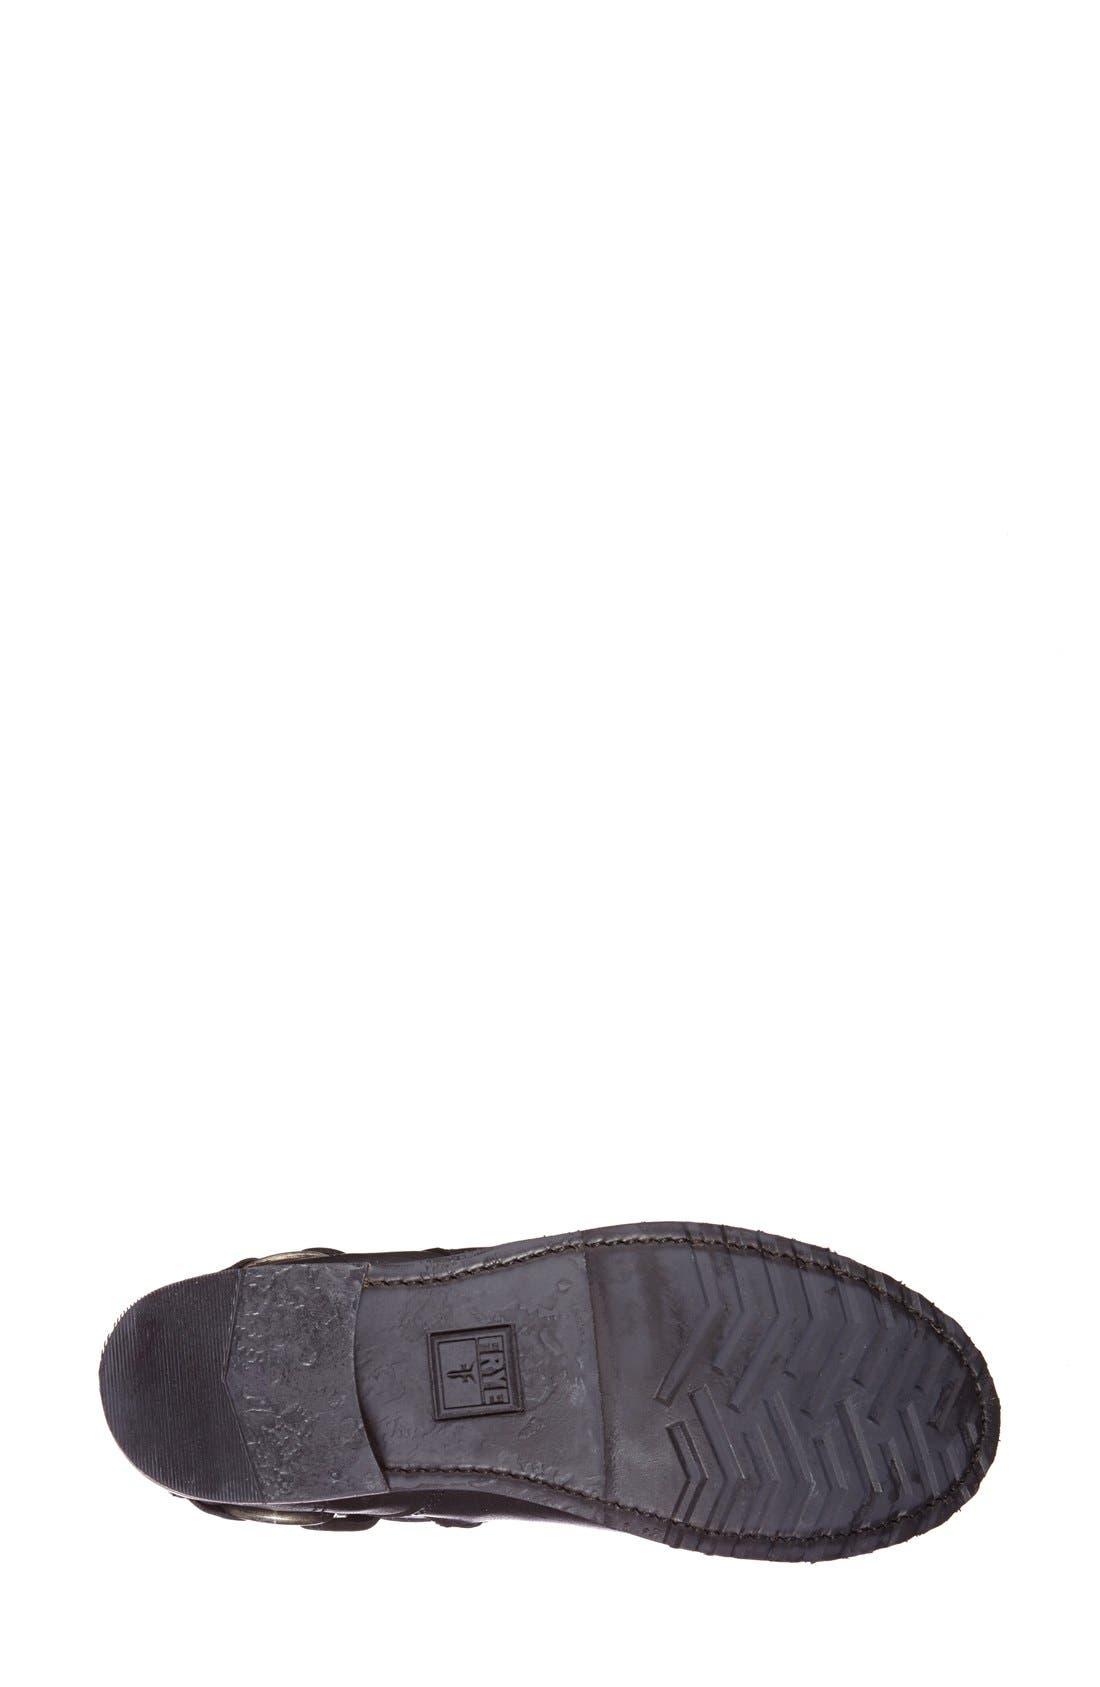 Alternate Image 4  - Frye 'Veronica' Crisscross Strap Short Leather Boot (Women)